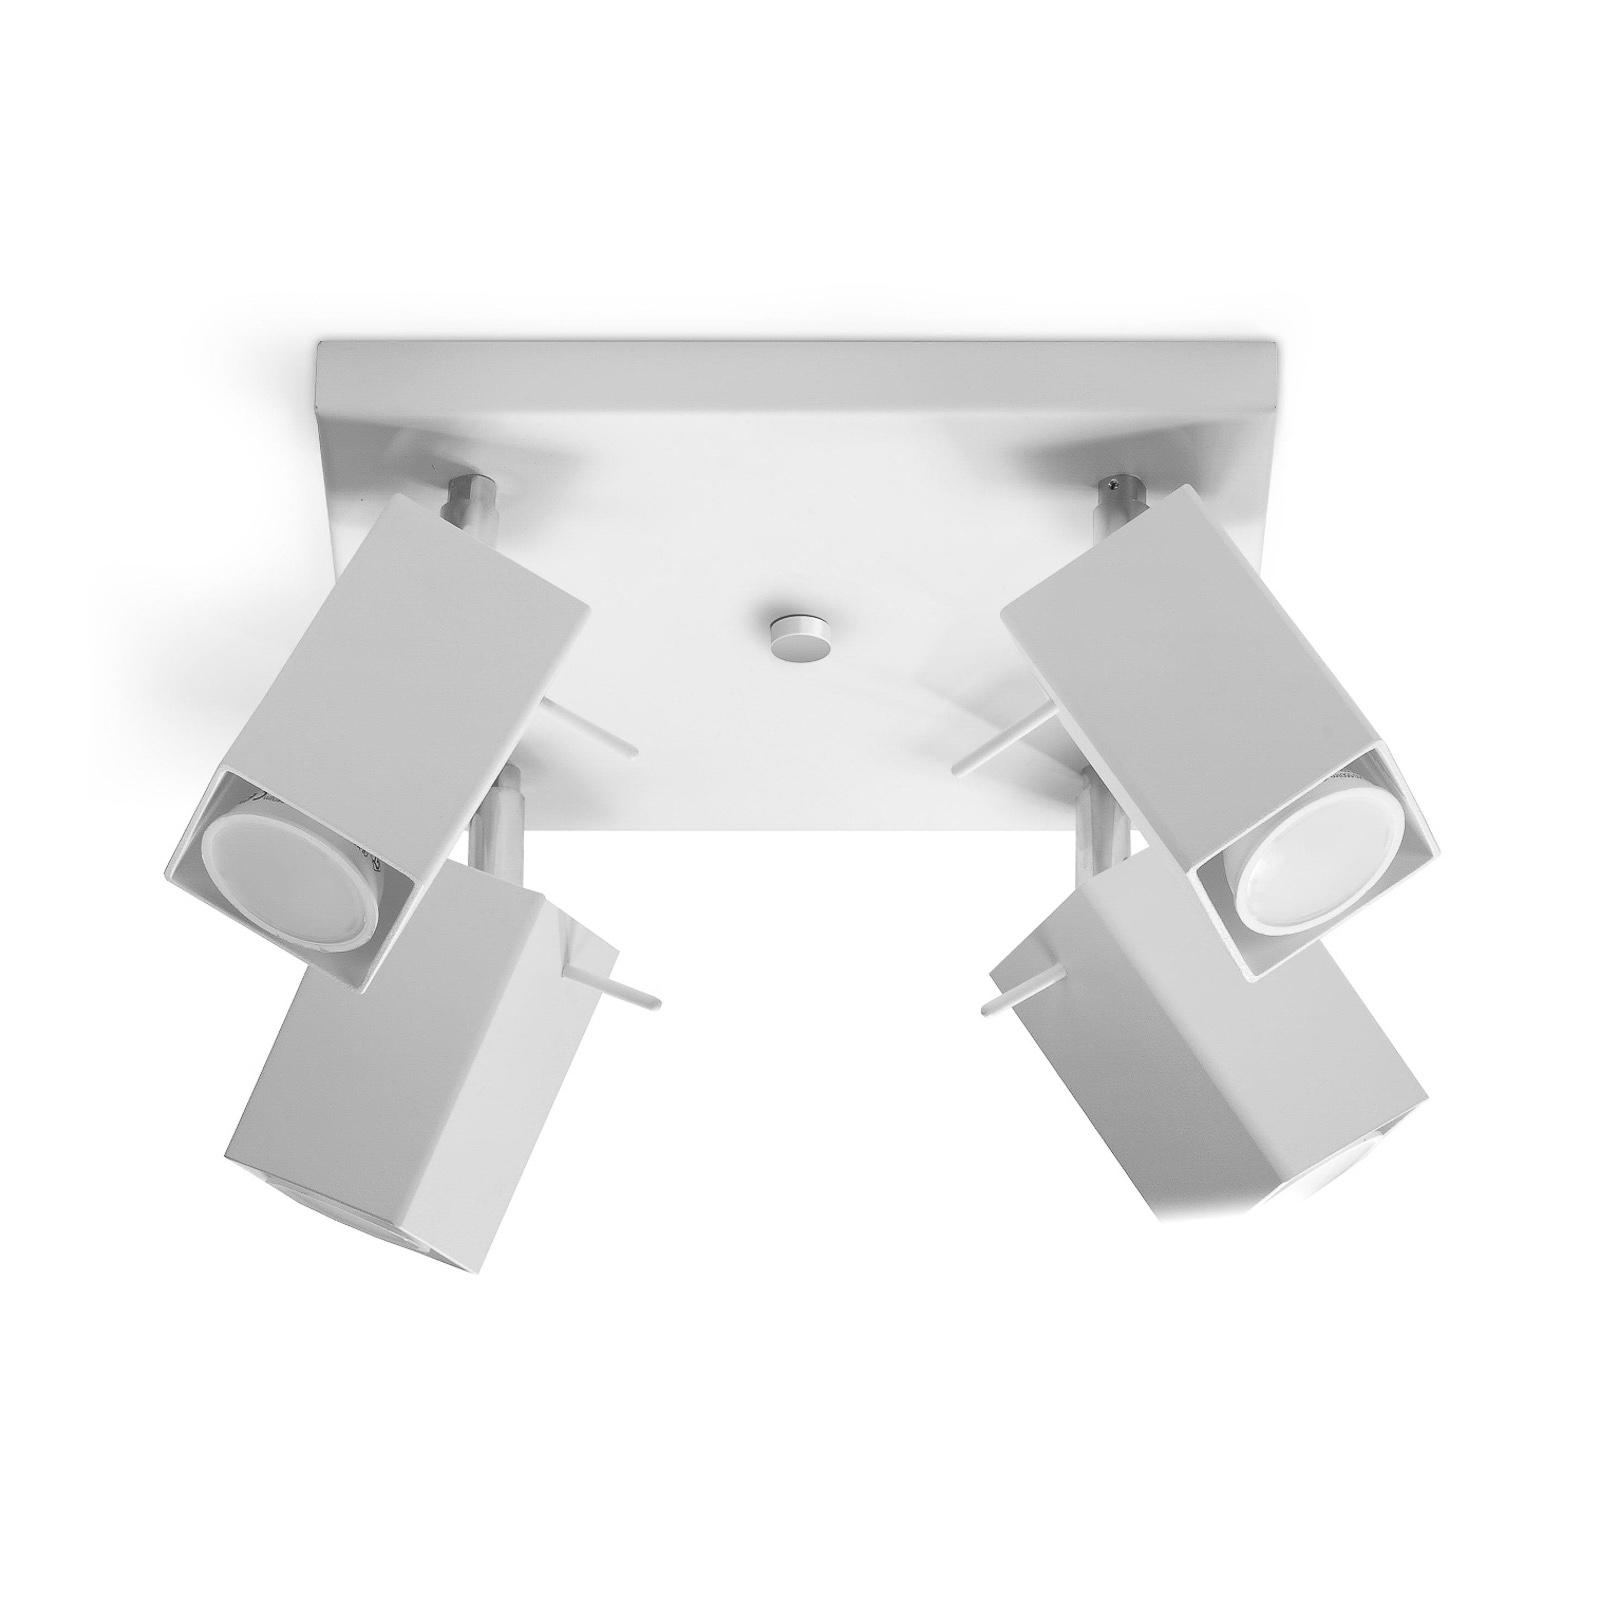 Takspot Square, hvit, 4 lyskilder, firkantet